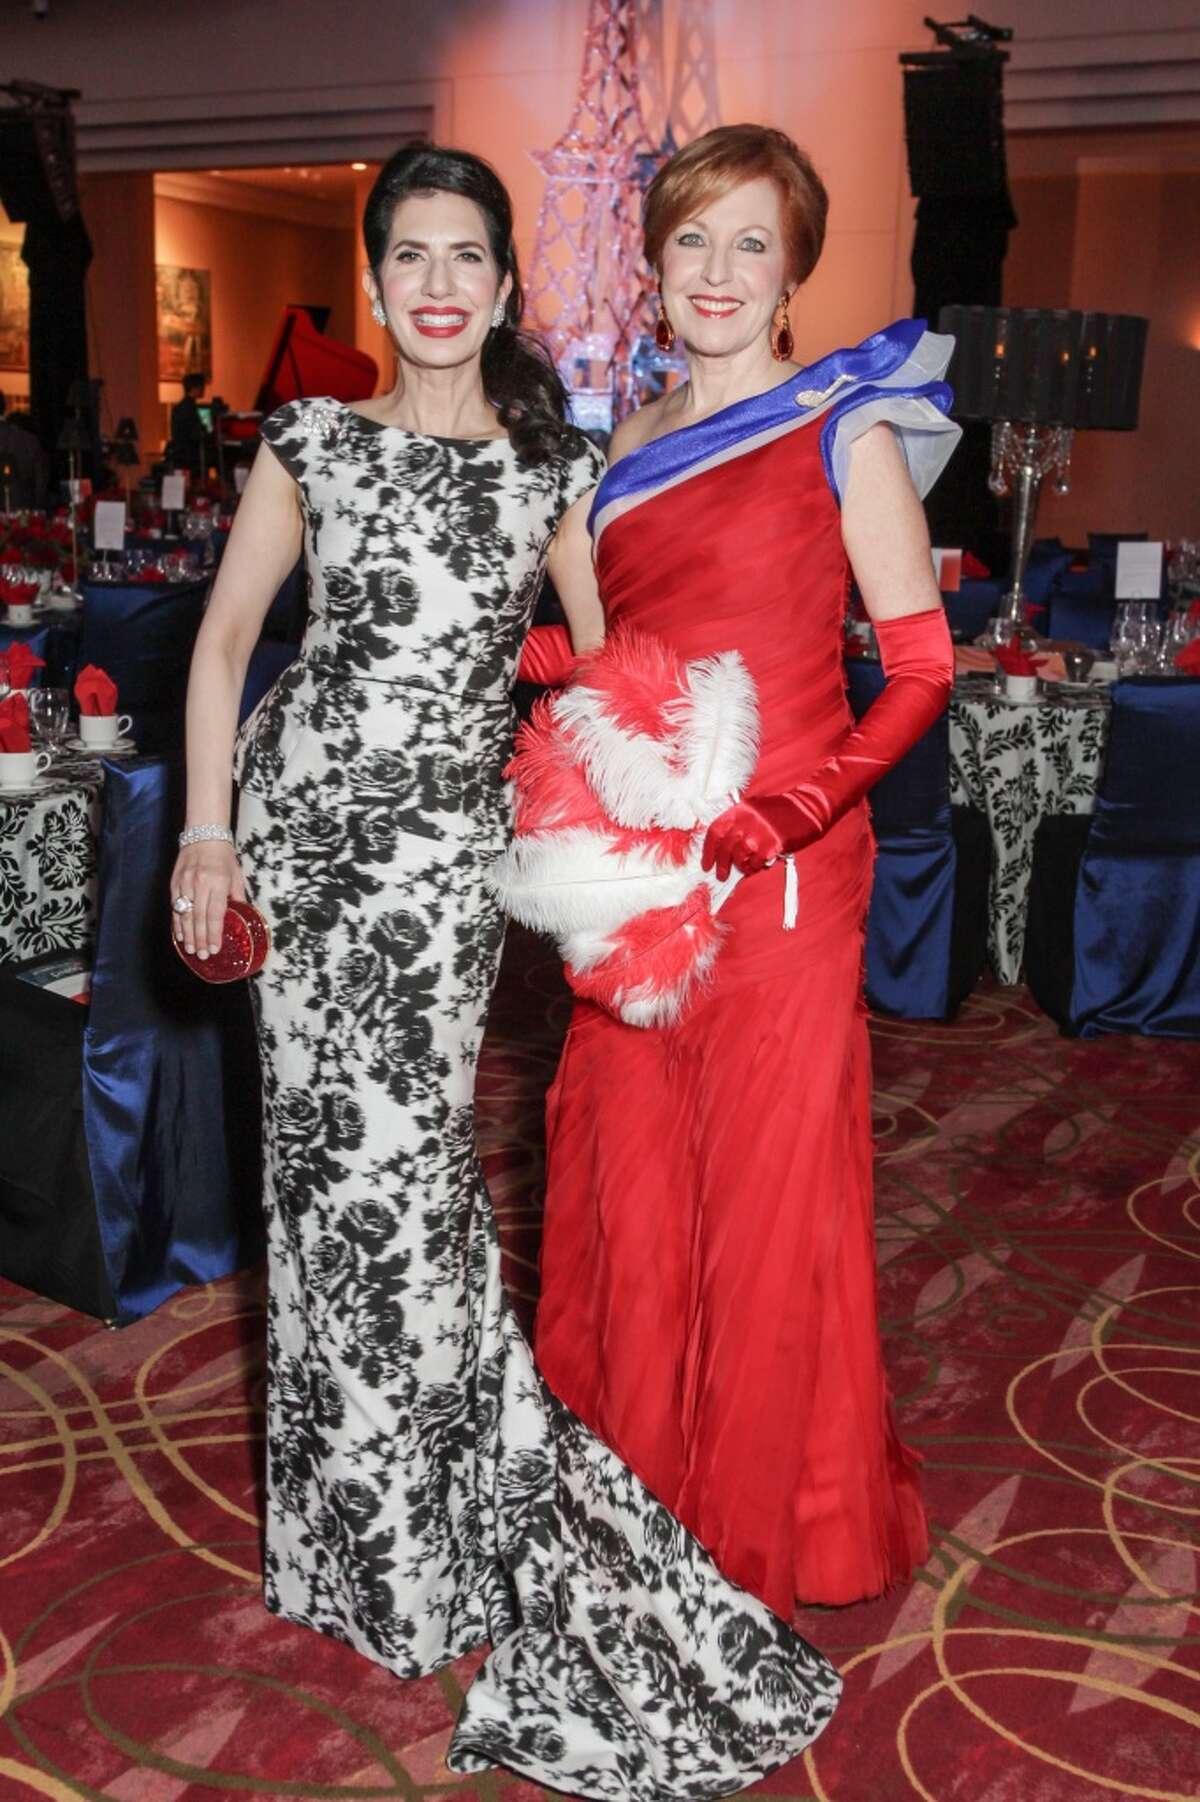 Kelli Cohen Fein and Nancy Strohmer